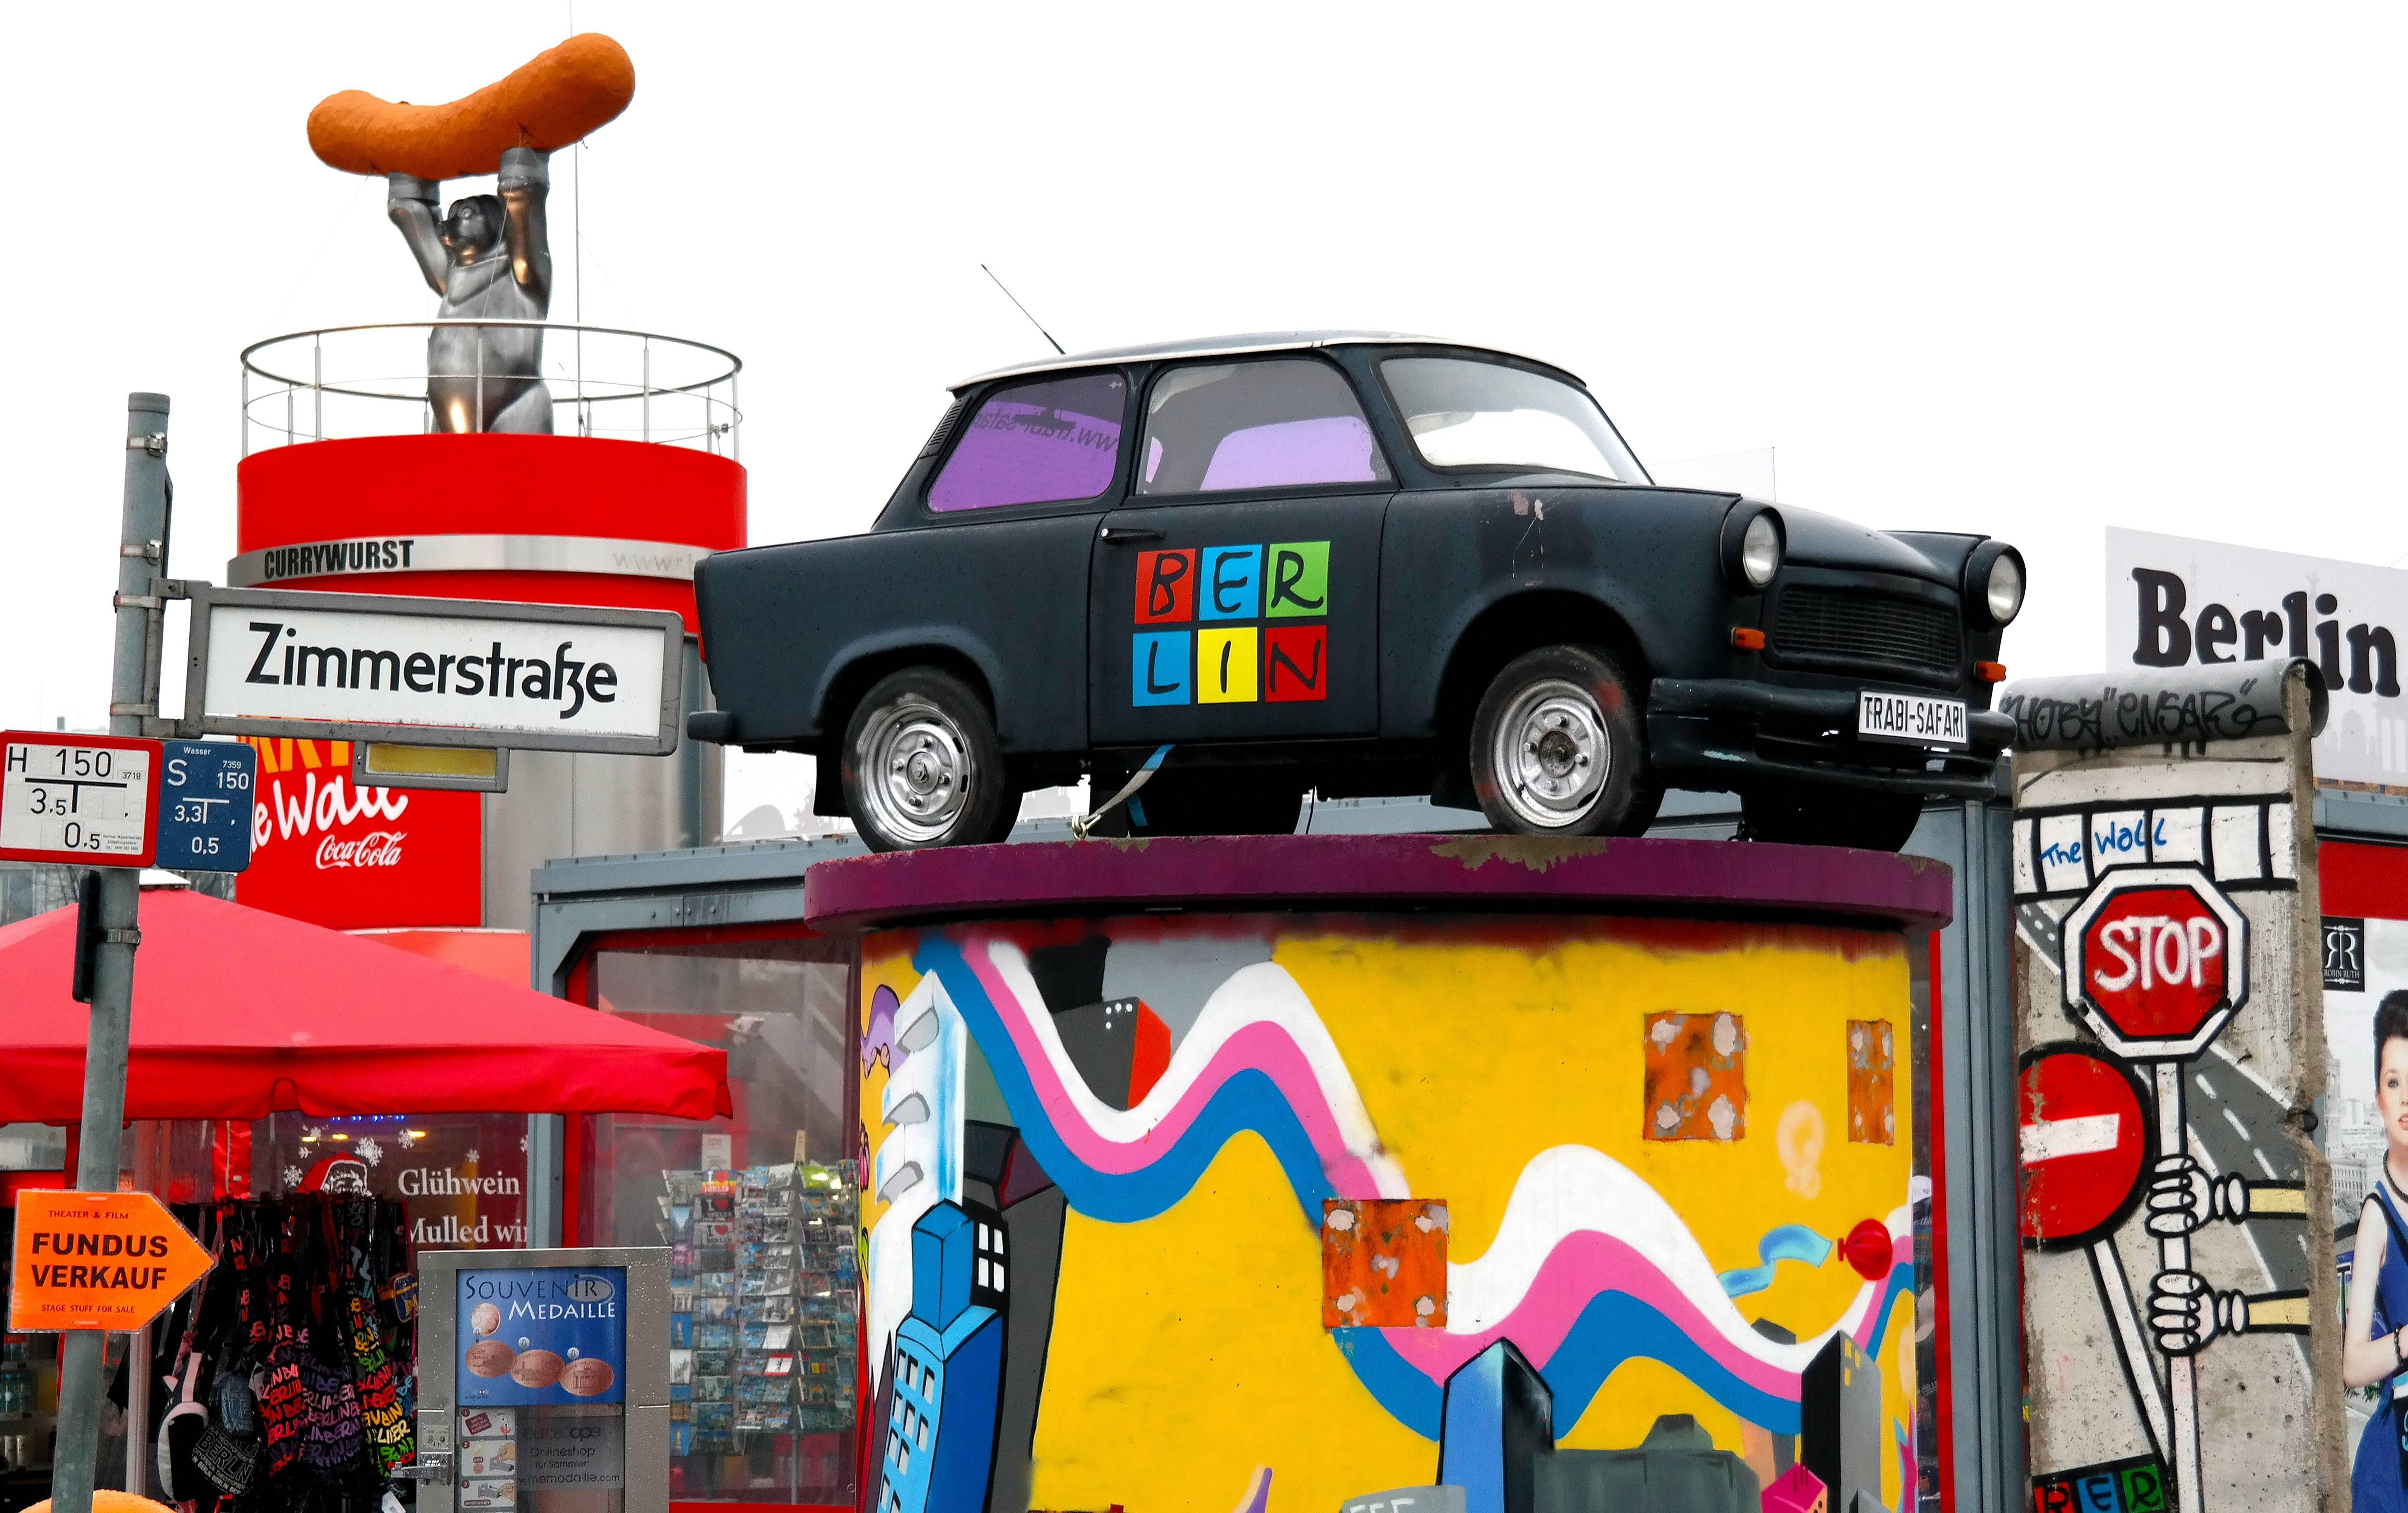 Аренда авто в берлине (berlin adlershof)